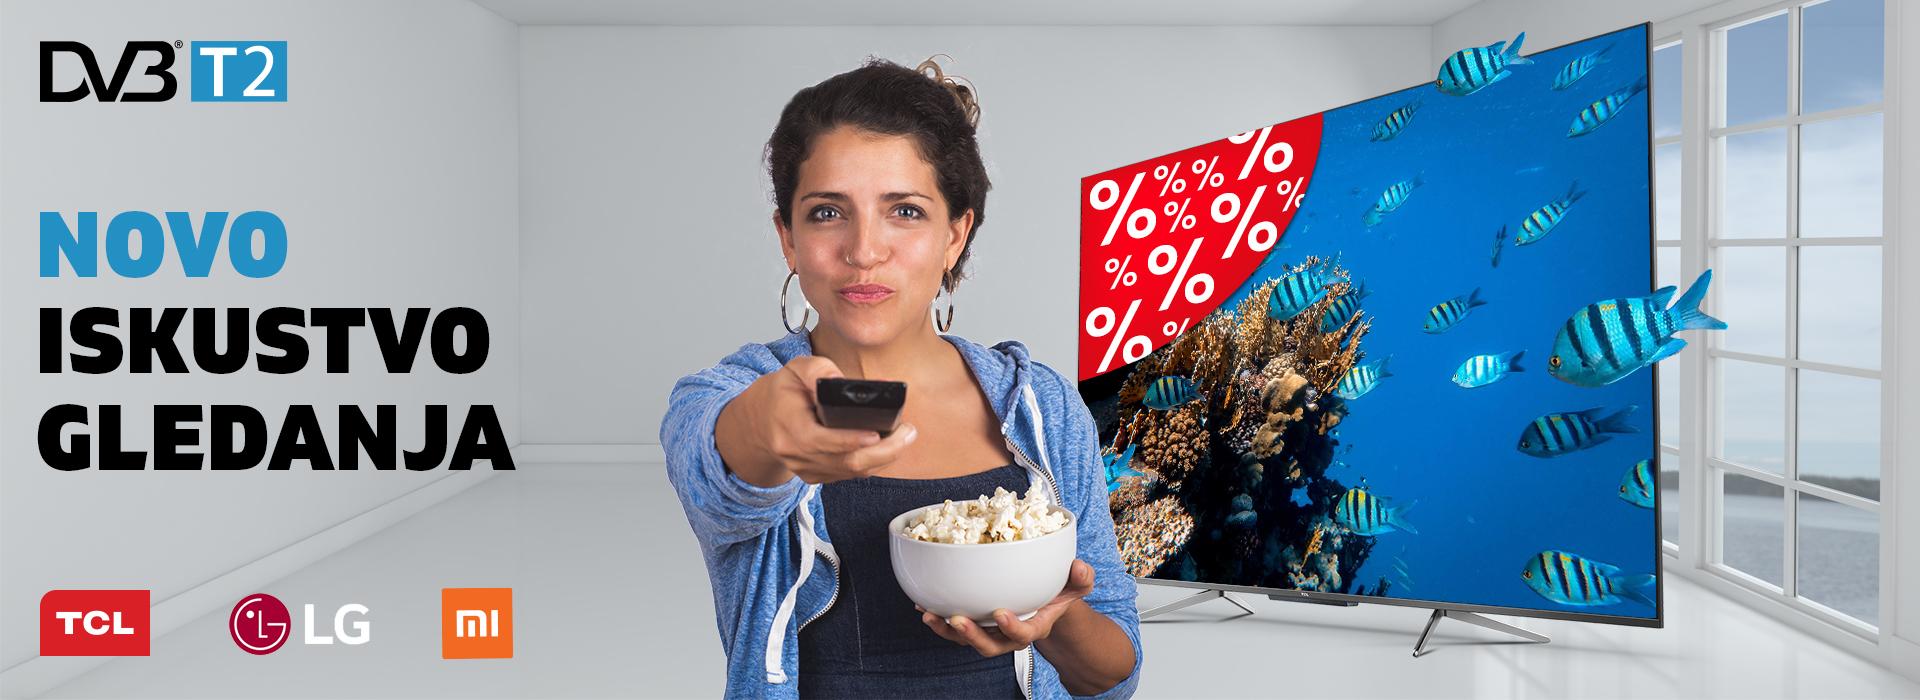 Spremni za novi signal? Iskoristite do 36% popusta na nove televizore!